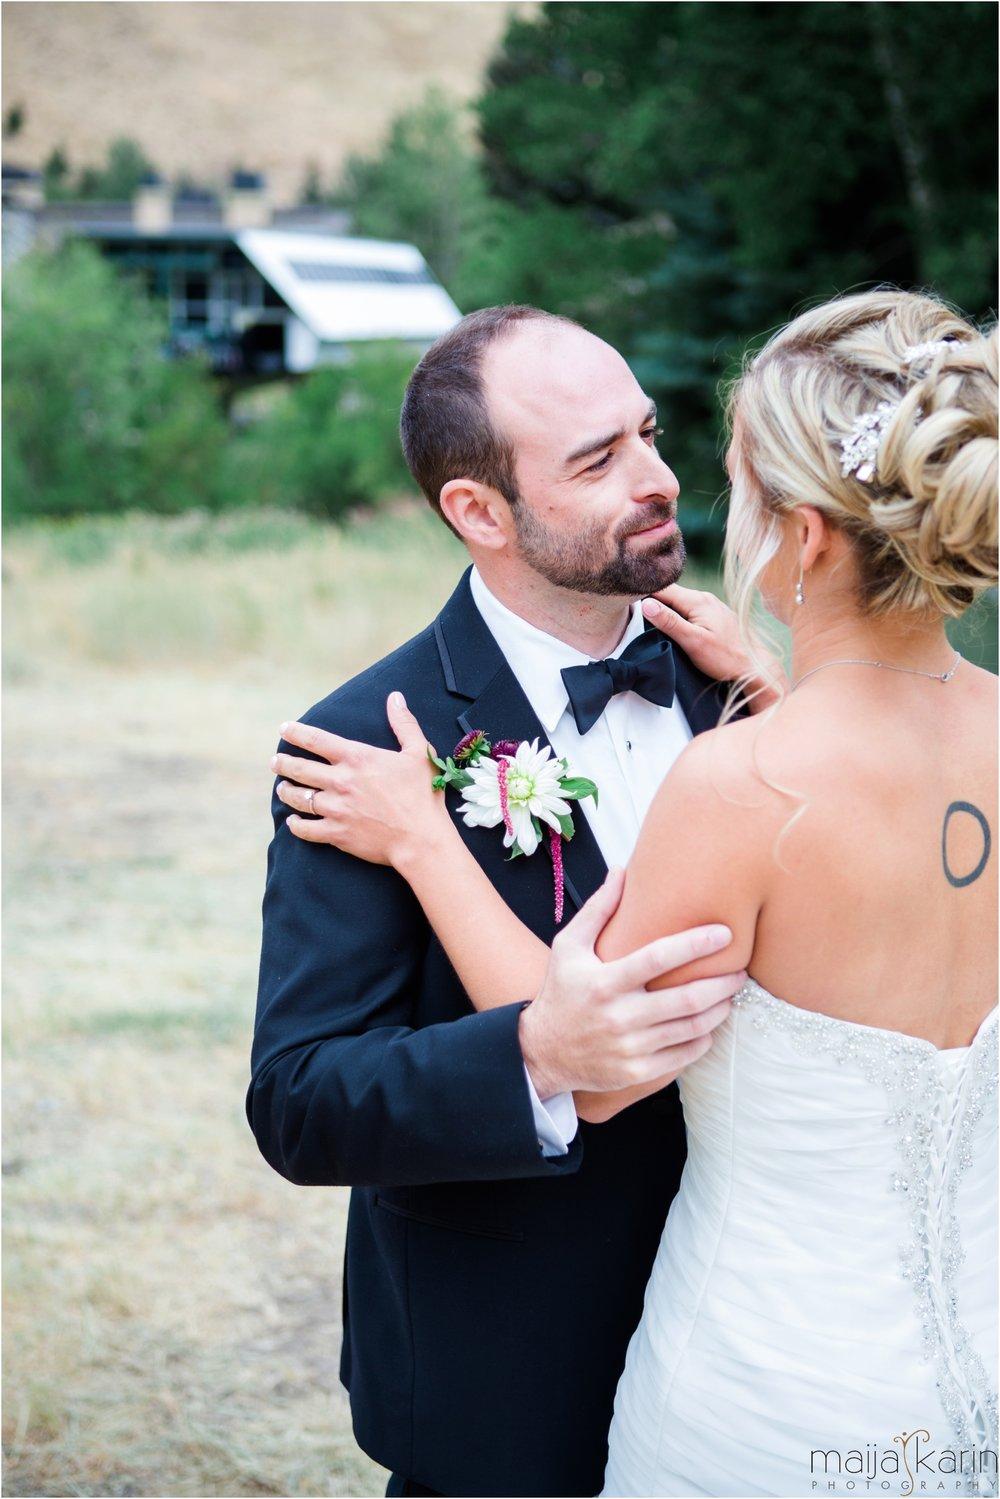 stree-free-images-wedding-guide-maija-karin-photography_0006.jpg